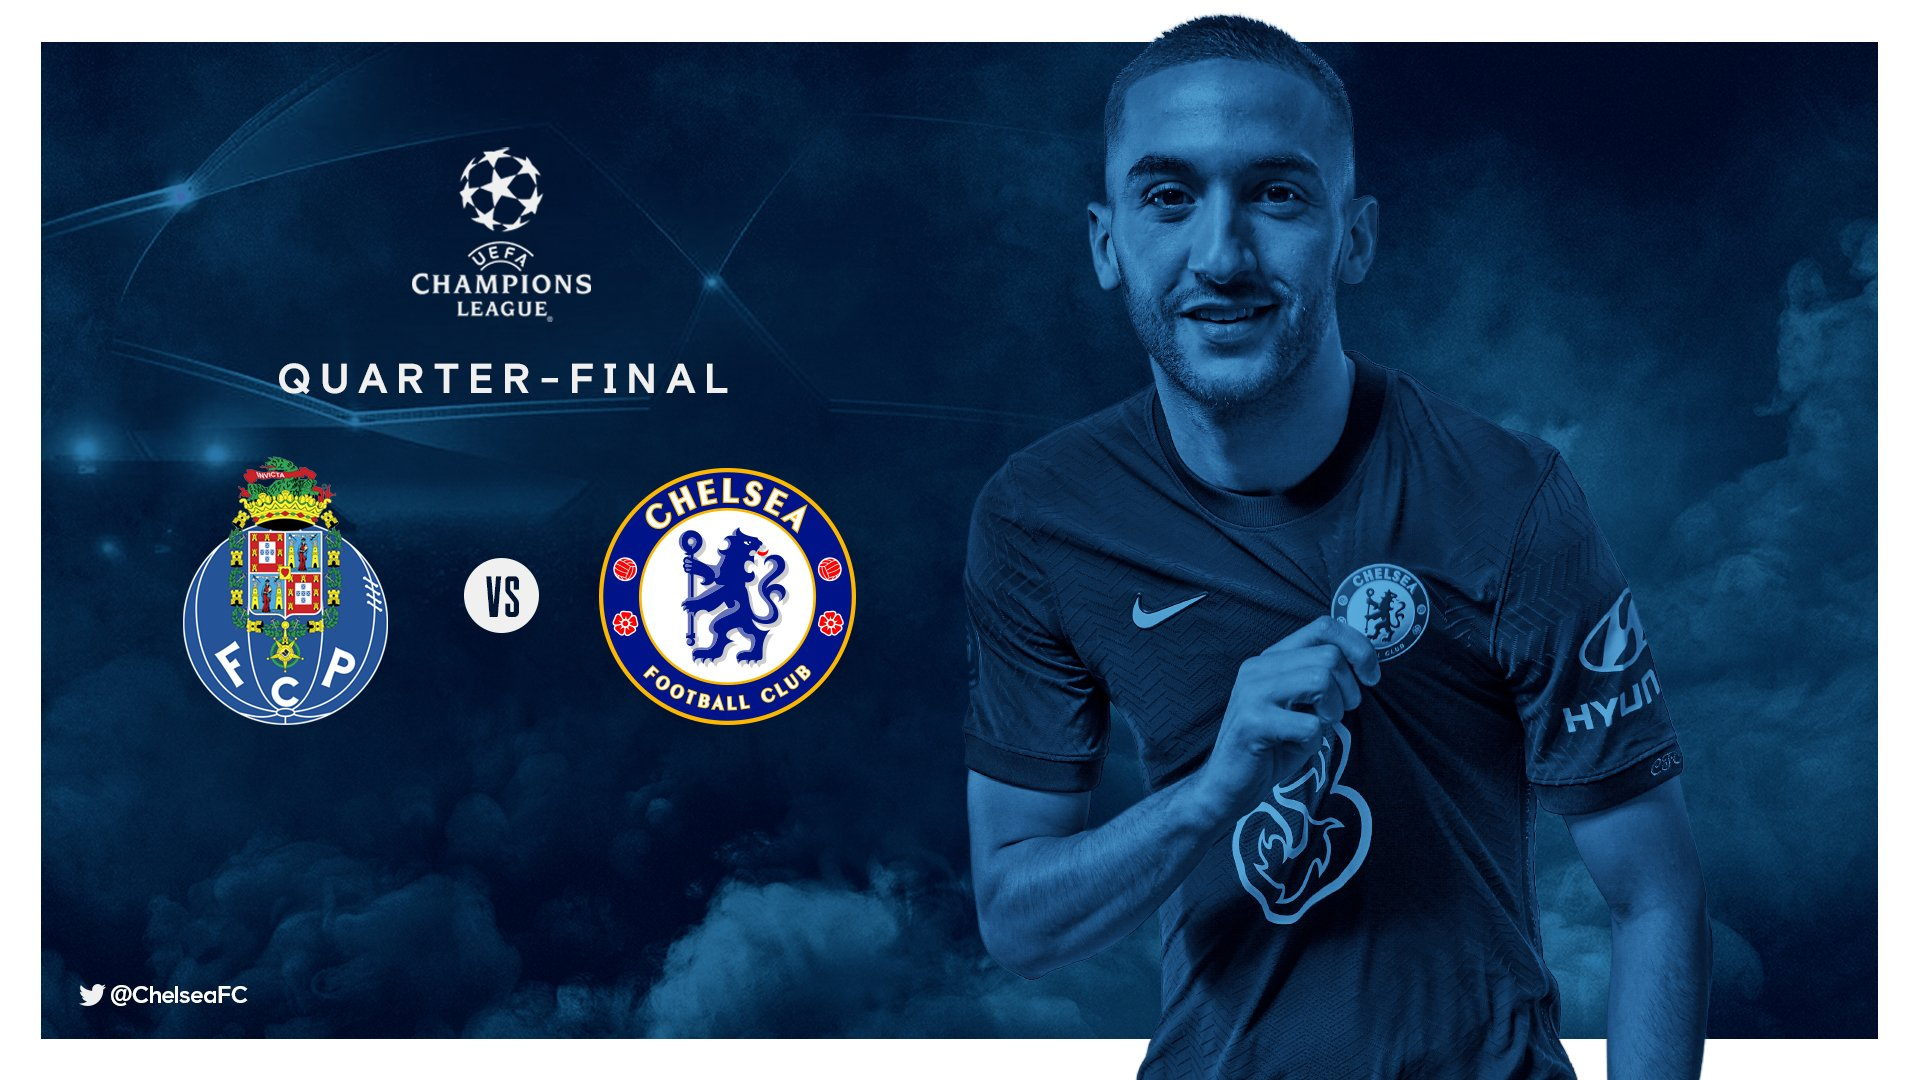 UCL QF 2020/21 | Porto - Chelsea Ew1qaipXMAUFViG?format=jpg&name=large